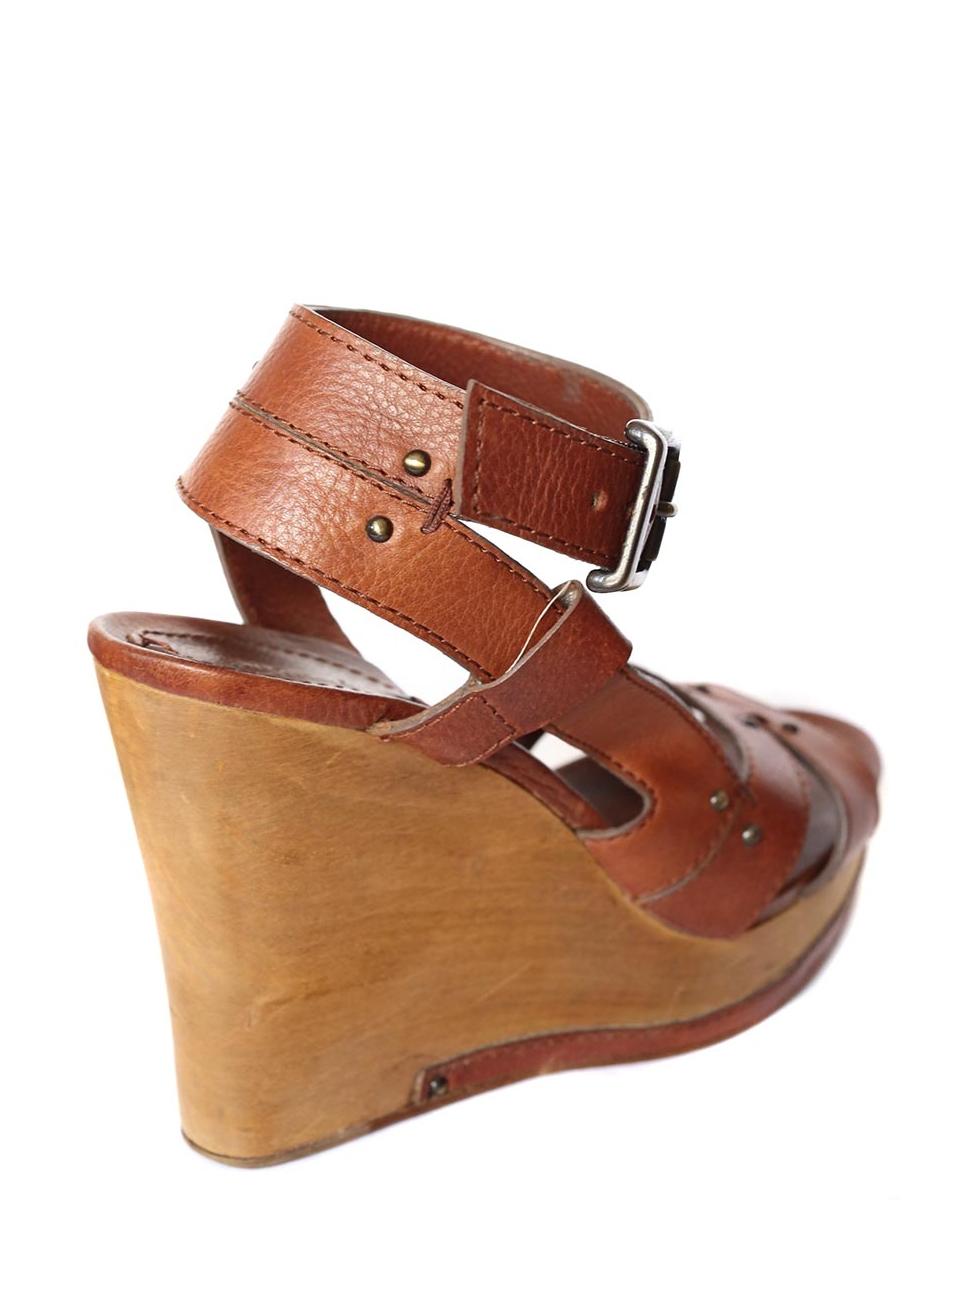 40c6ee41842271 Louise Paris - CHLOE Camel brown leather wedge wooden heel sandals Retail  price 550€ Size 39